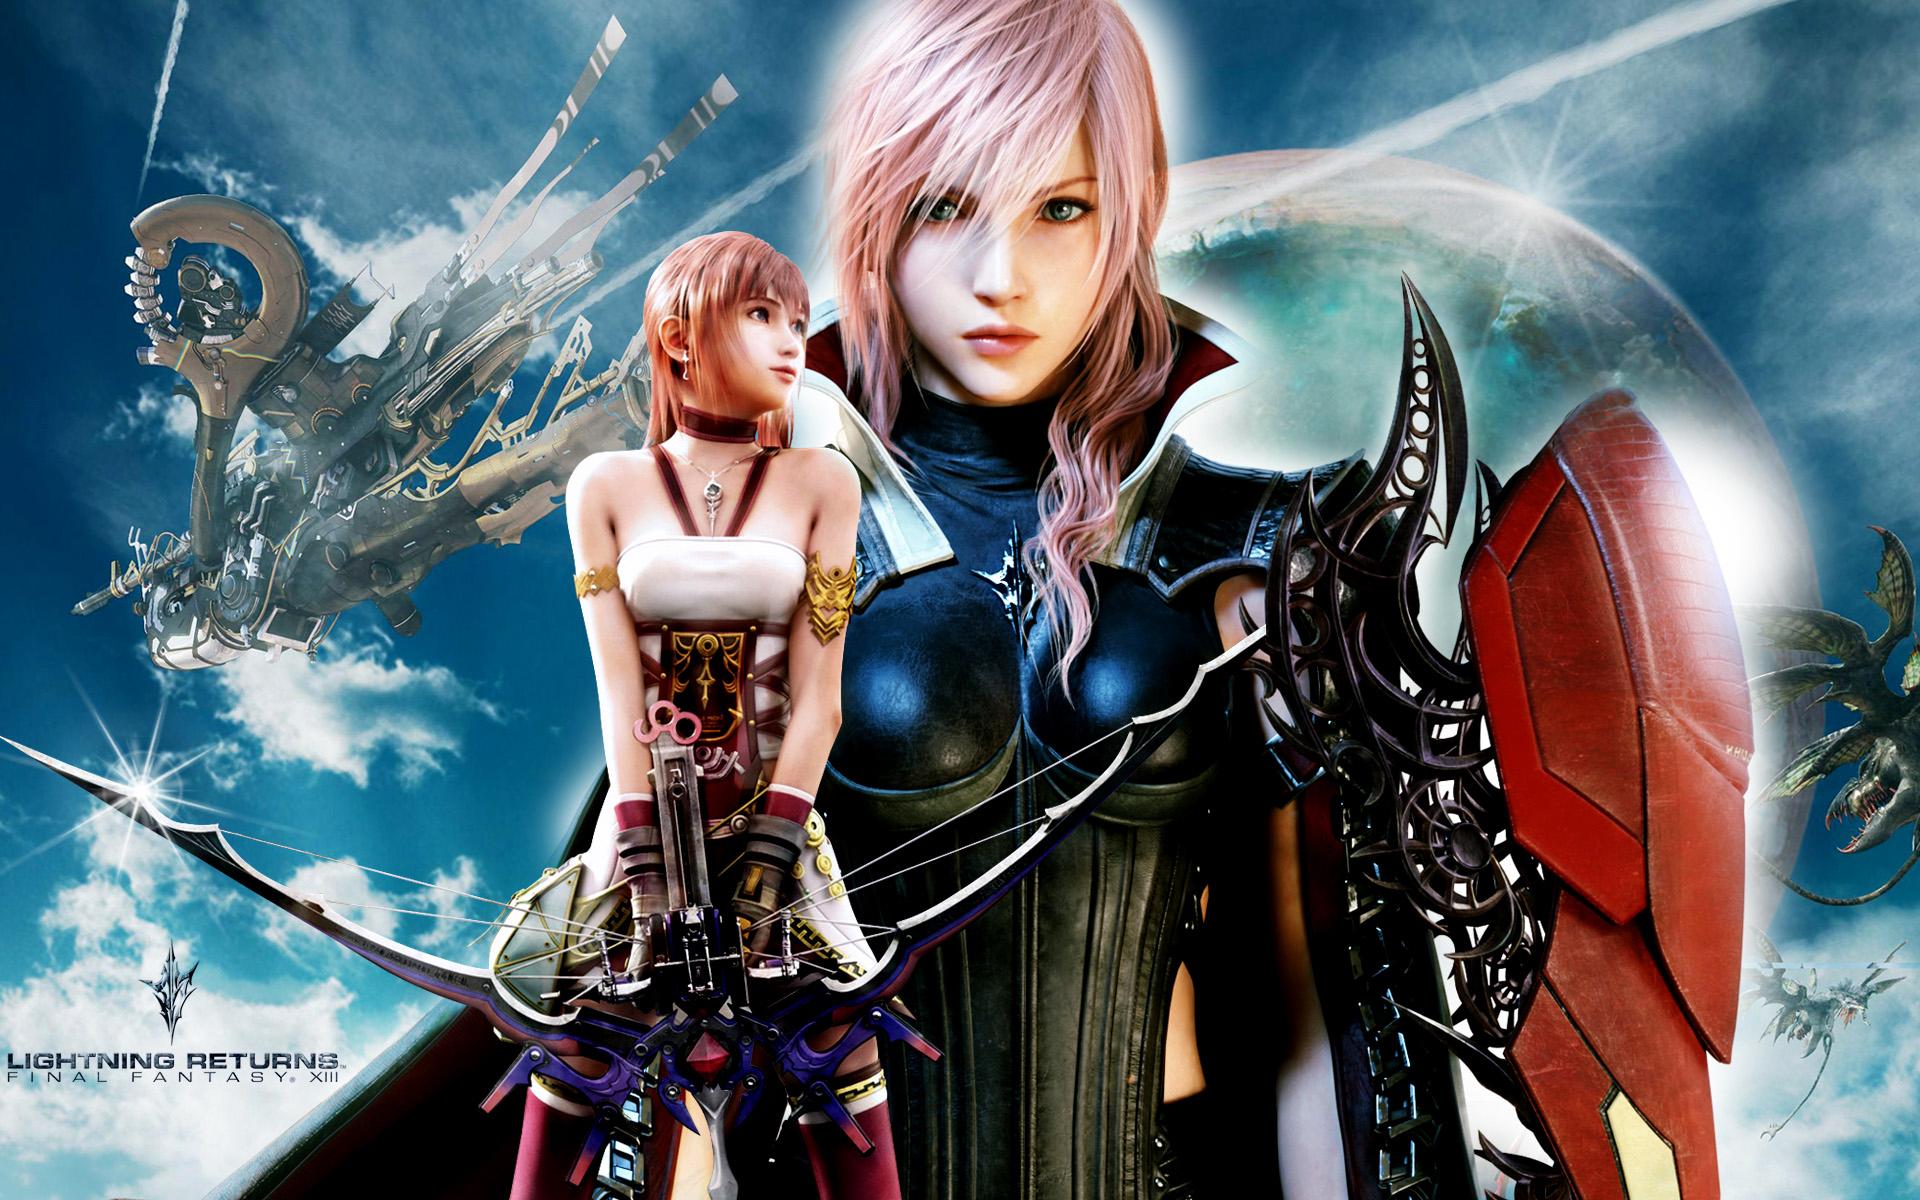 Xbox 360 Final Fantasy 13 Cheats Lightning Returns Final Fantasy Xiiiwide